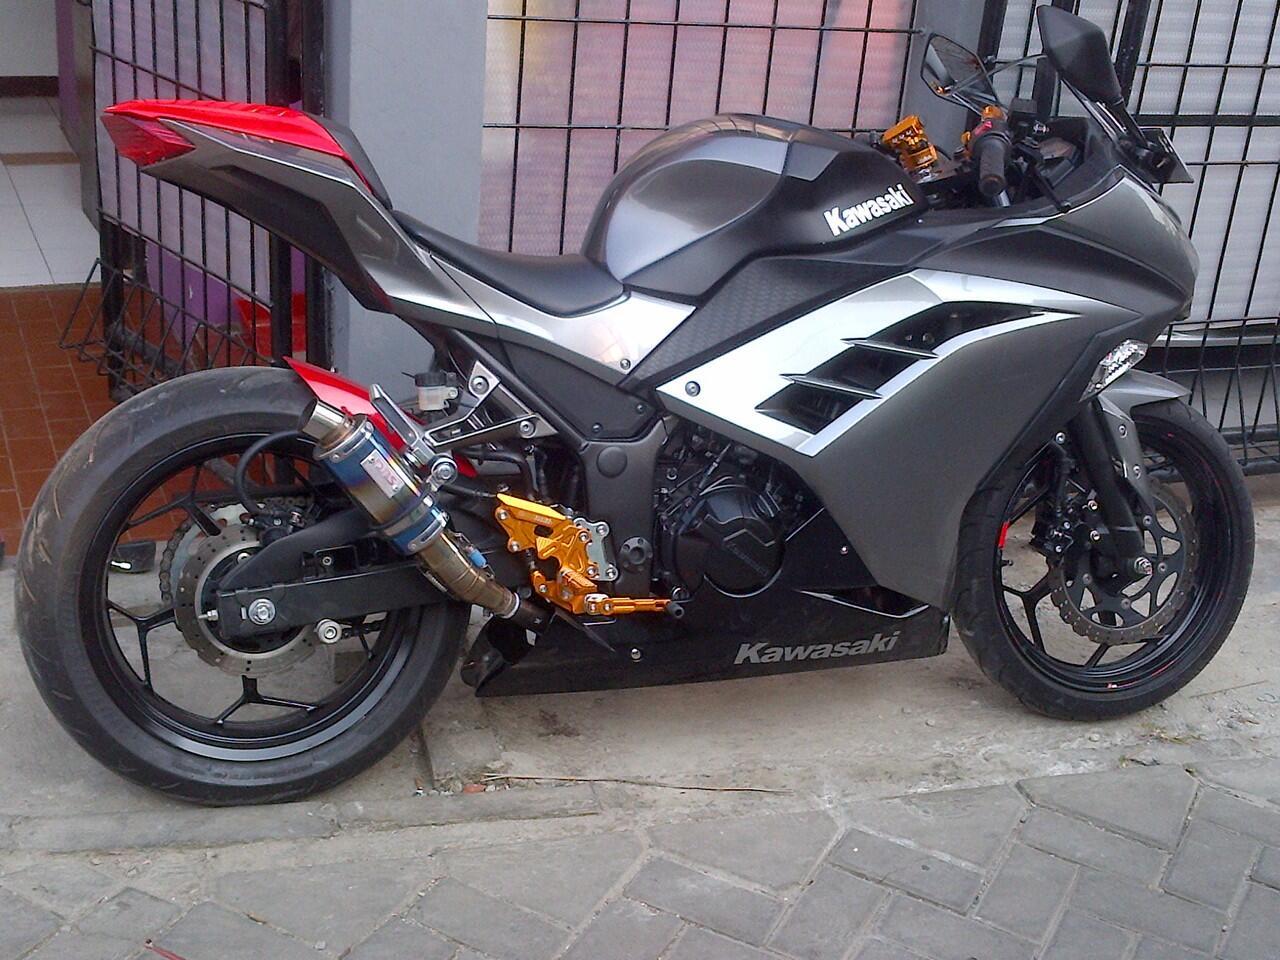 Terjual Kawasaki Ninja 250 Fi 14 Modifikasi